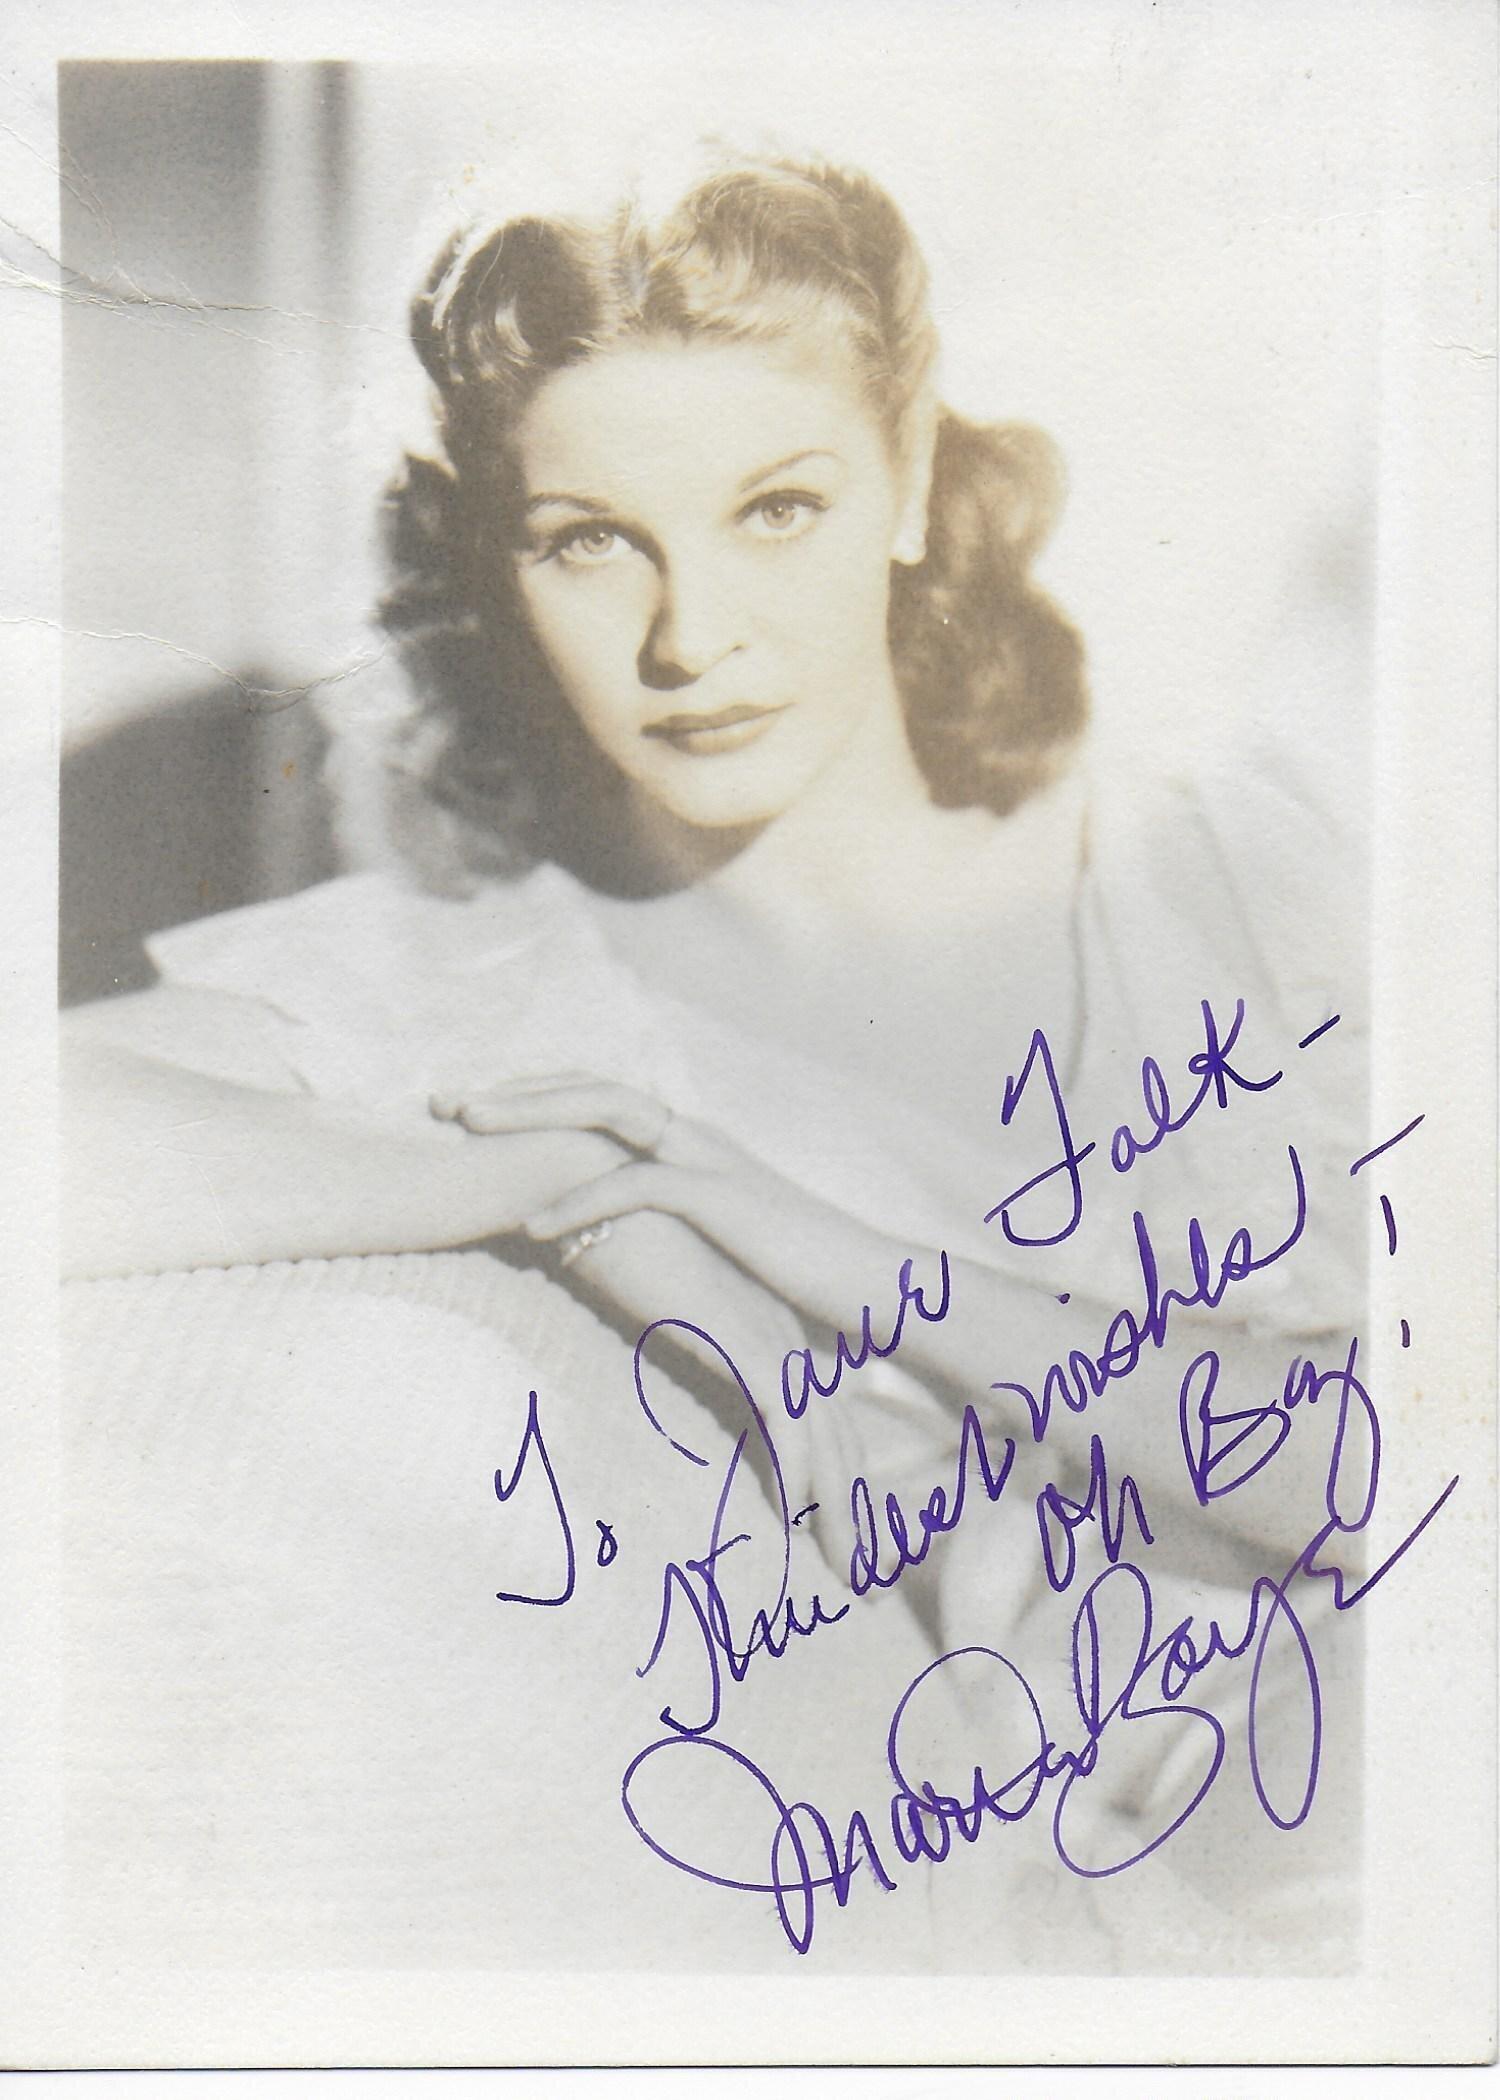 Martha Raye Vintage photo personalized to Jane Falk (approx. 3X5)